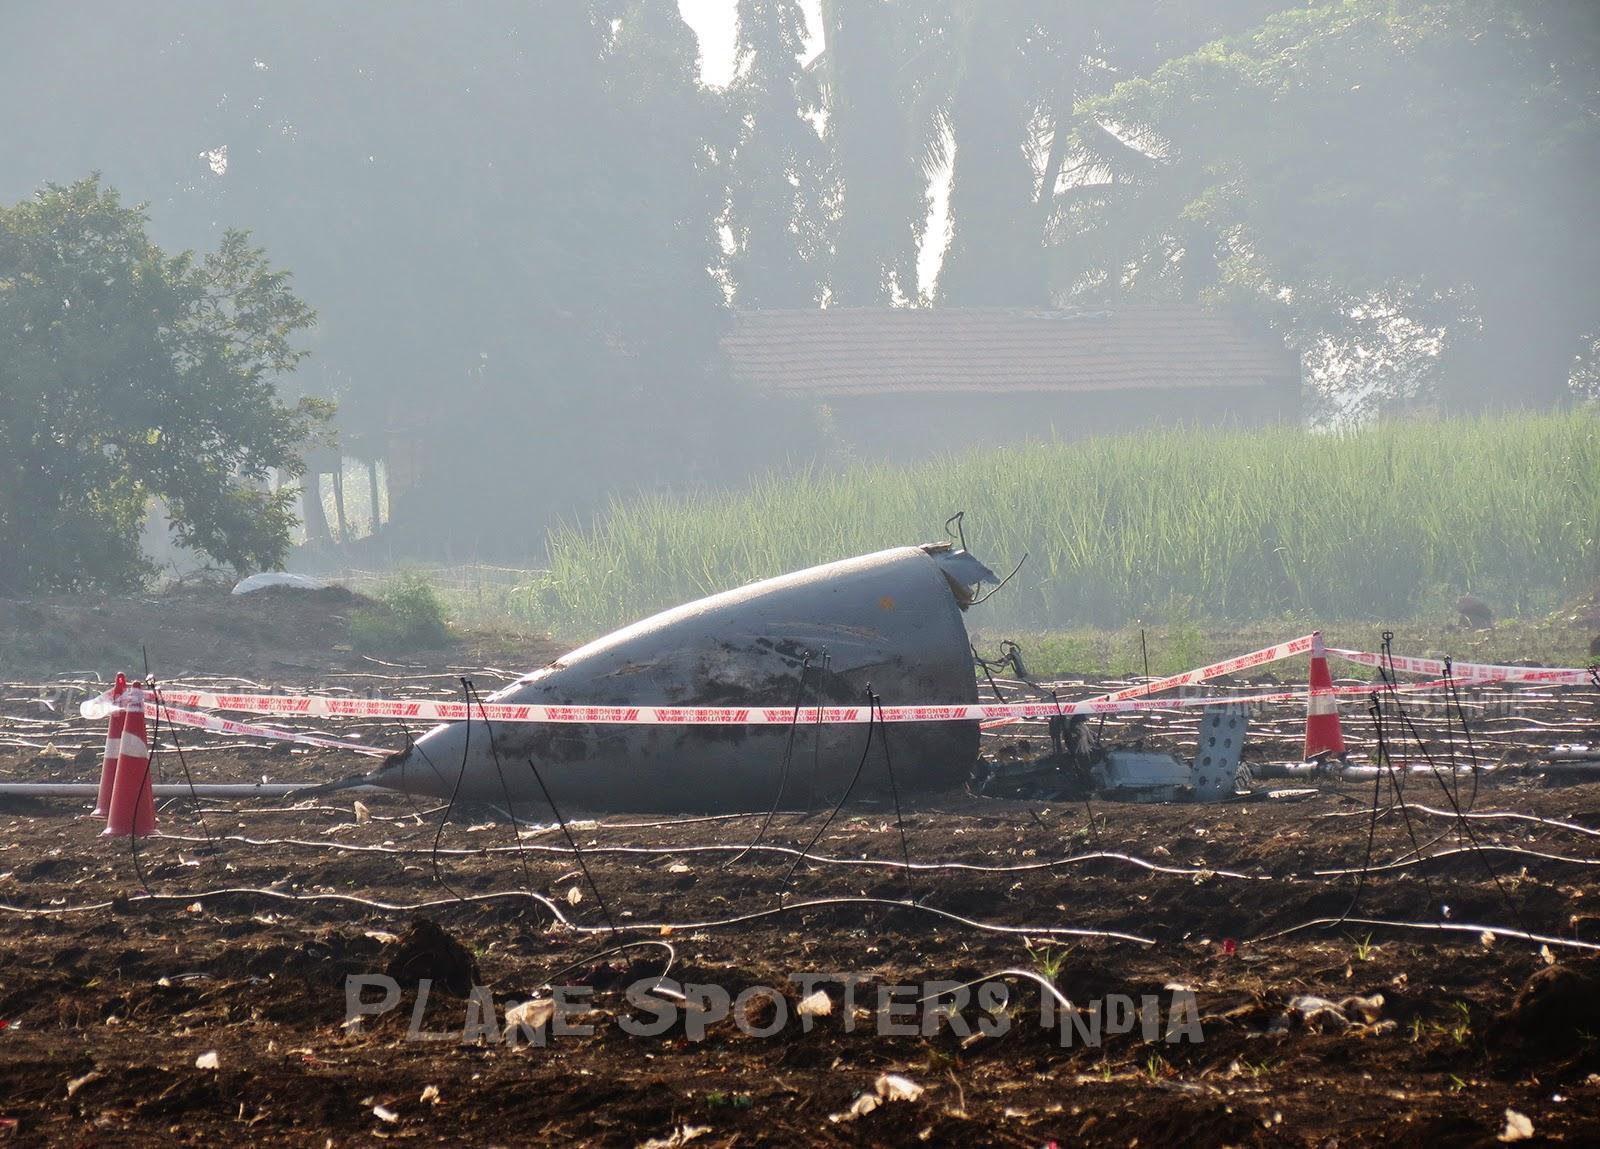 Air Crash, IAF Crash, IAF News, Pune Crash, Pune India, Su30, SU30 Crash, Su30 Crash Pune, Sukhoi Crash Pune, Sukhoi Su30 Crash Pune, Sukhoi crash near pune,